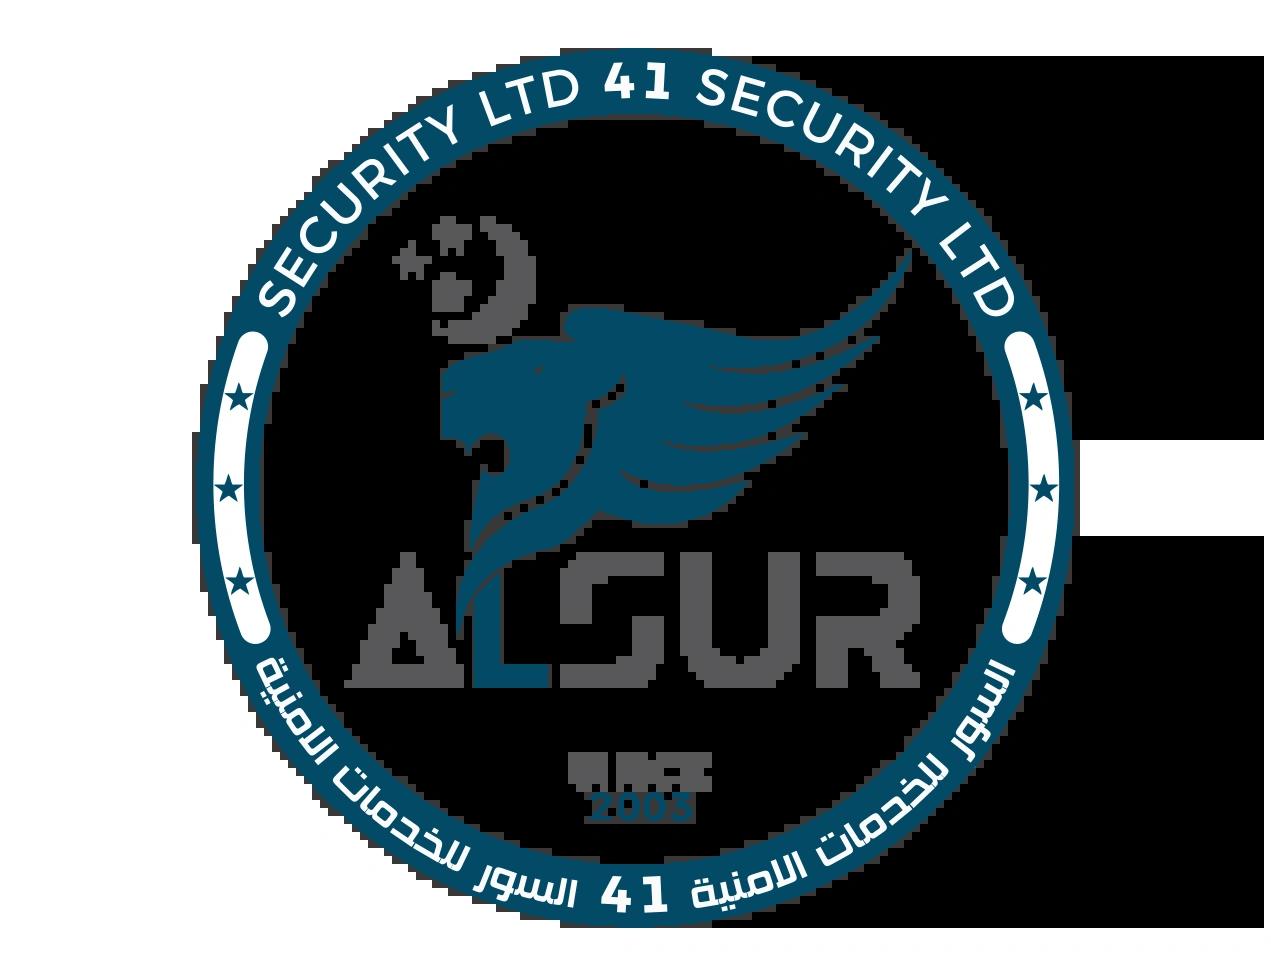 About US | alsursecurity